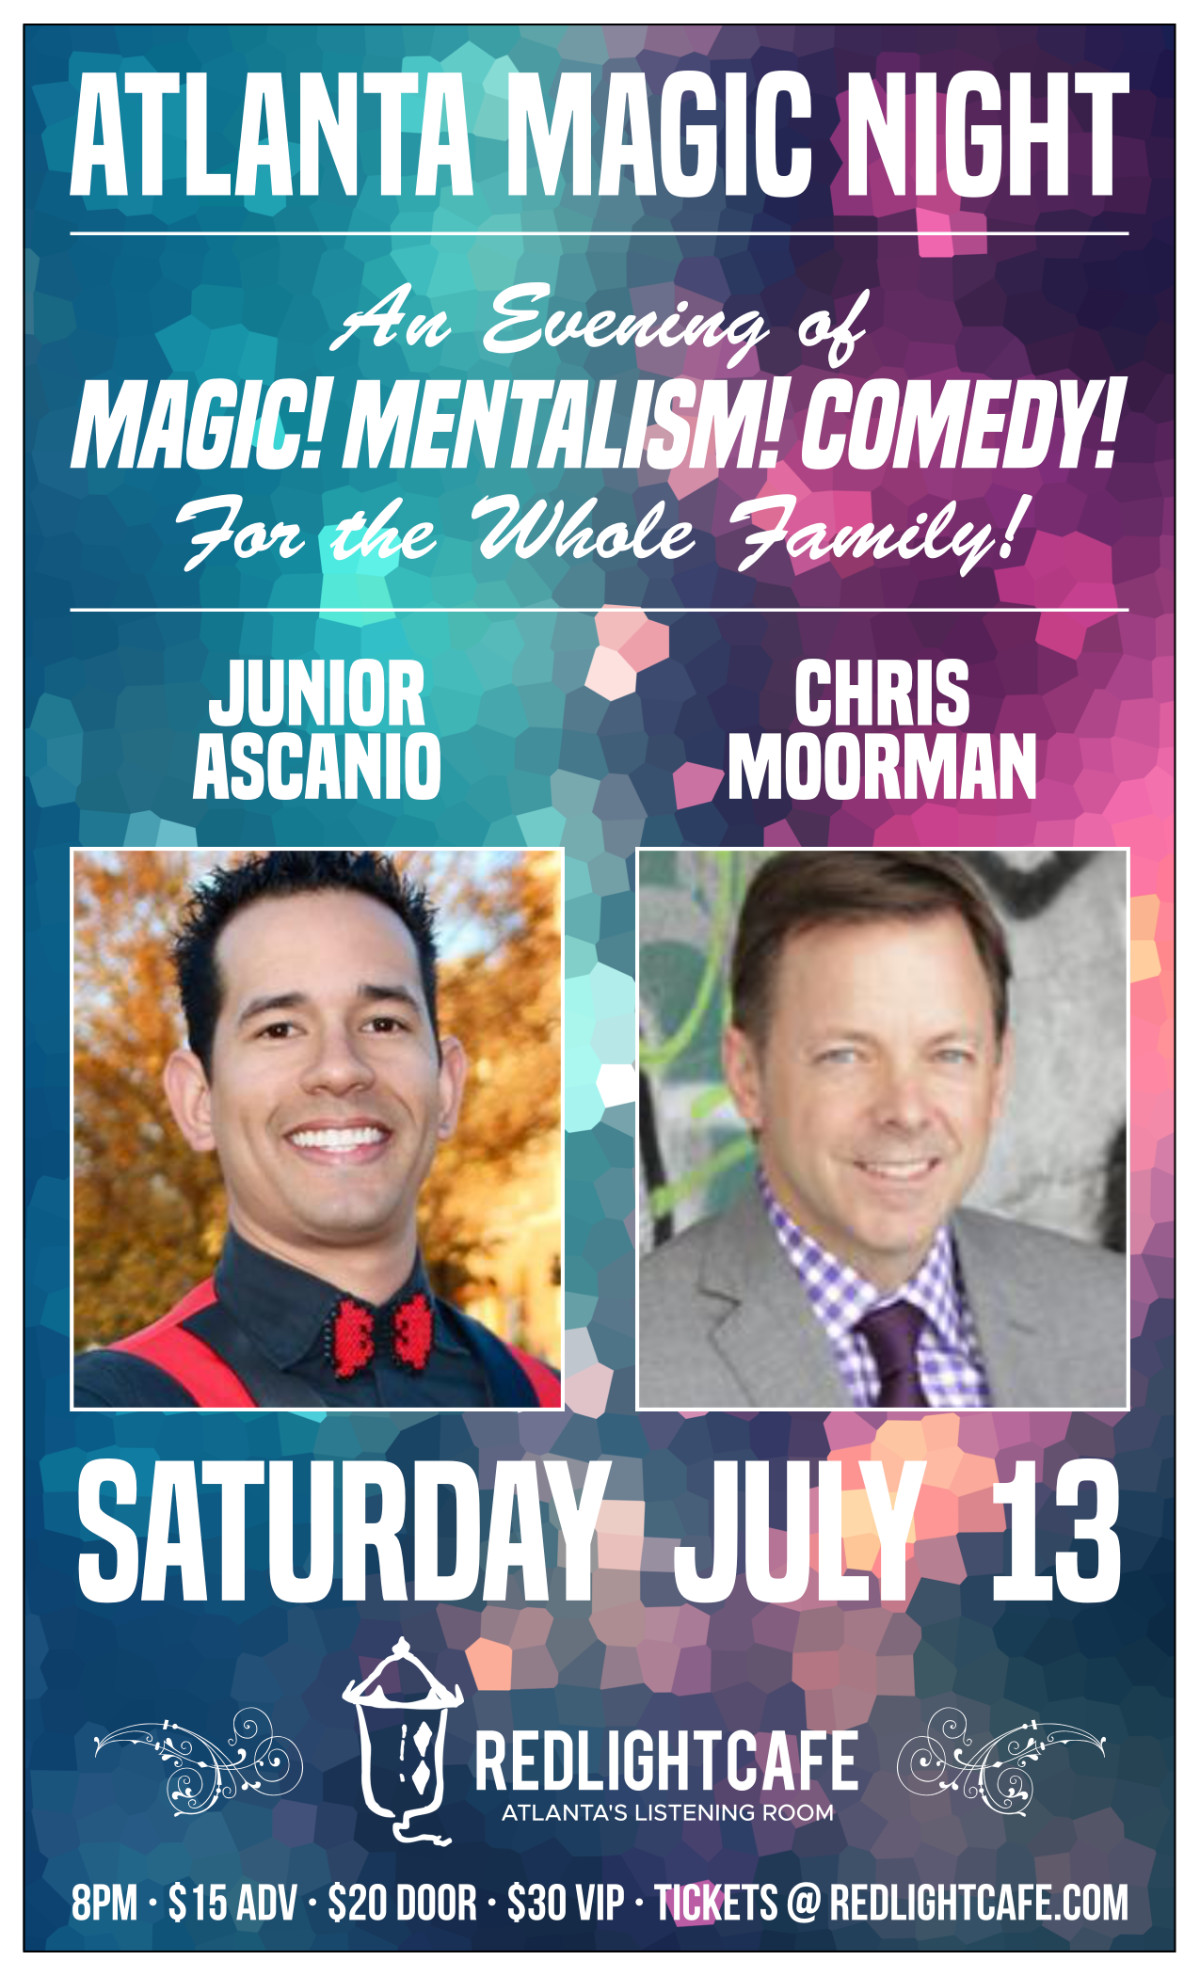 Atlanta Magic Night! w/ Junior Ascanio + Chris Moorman — July 13, 2019 — Red Light Café, Atlanta, GA